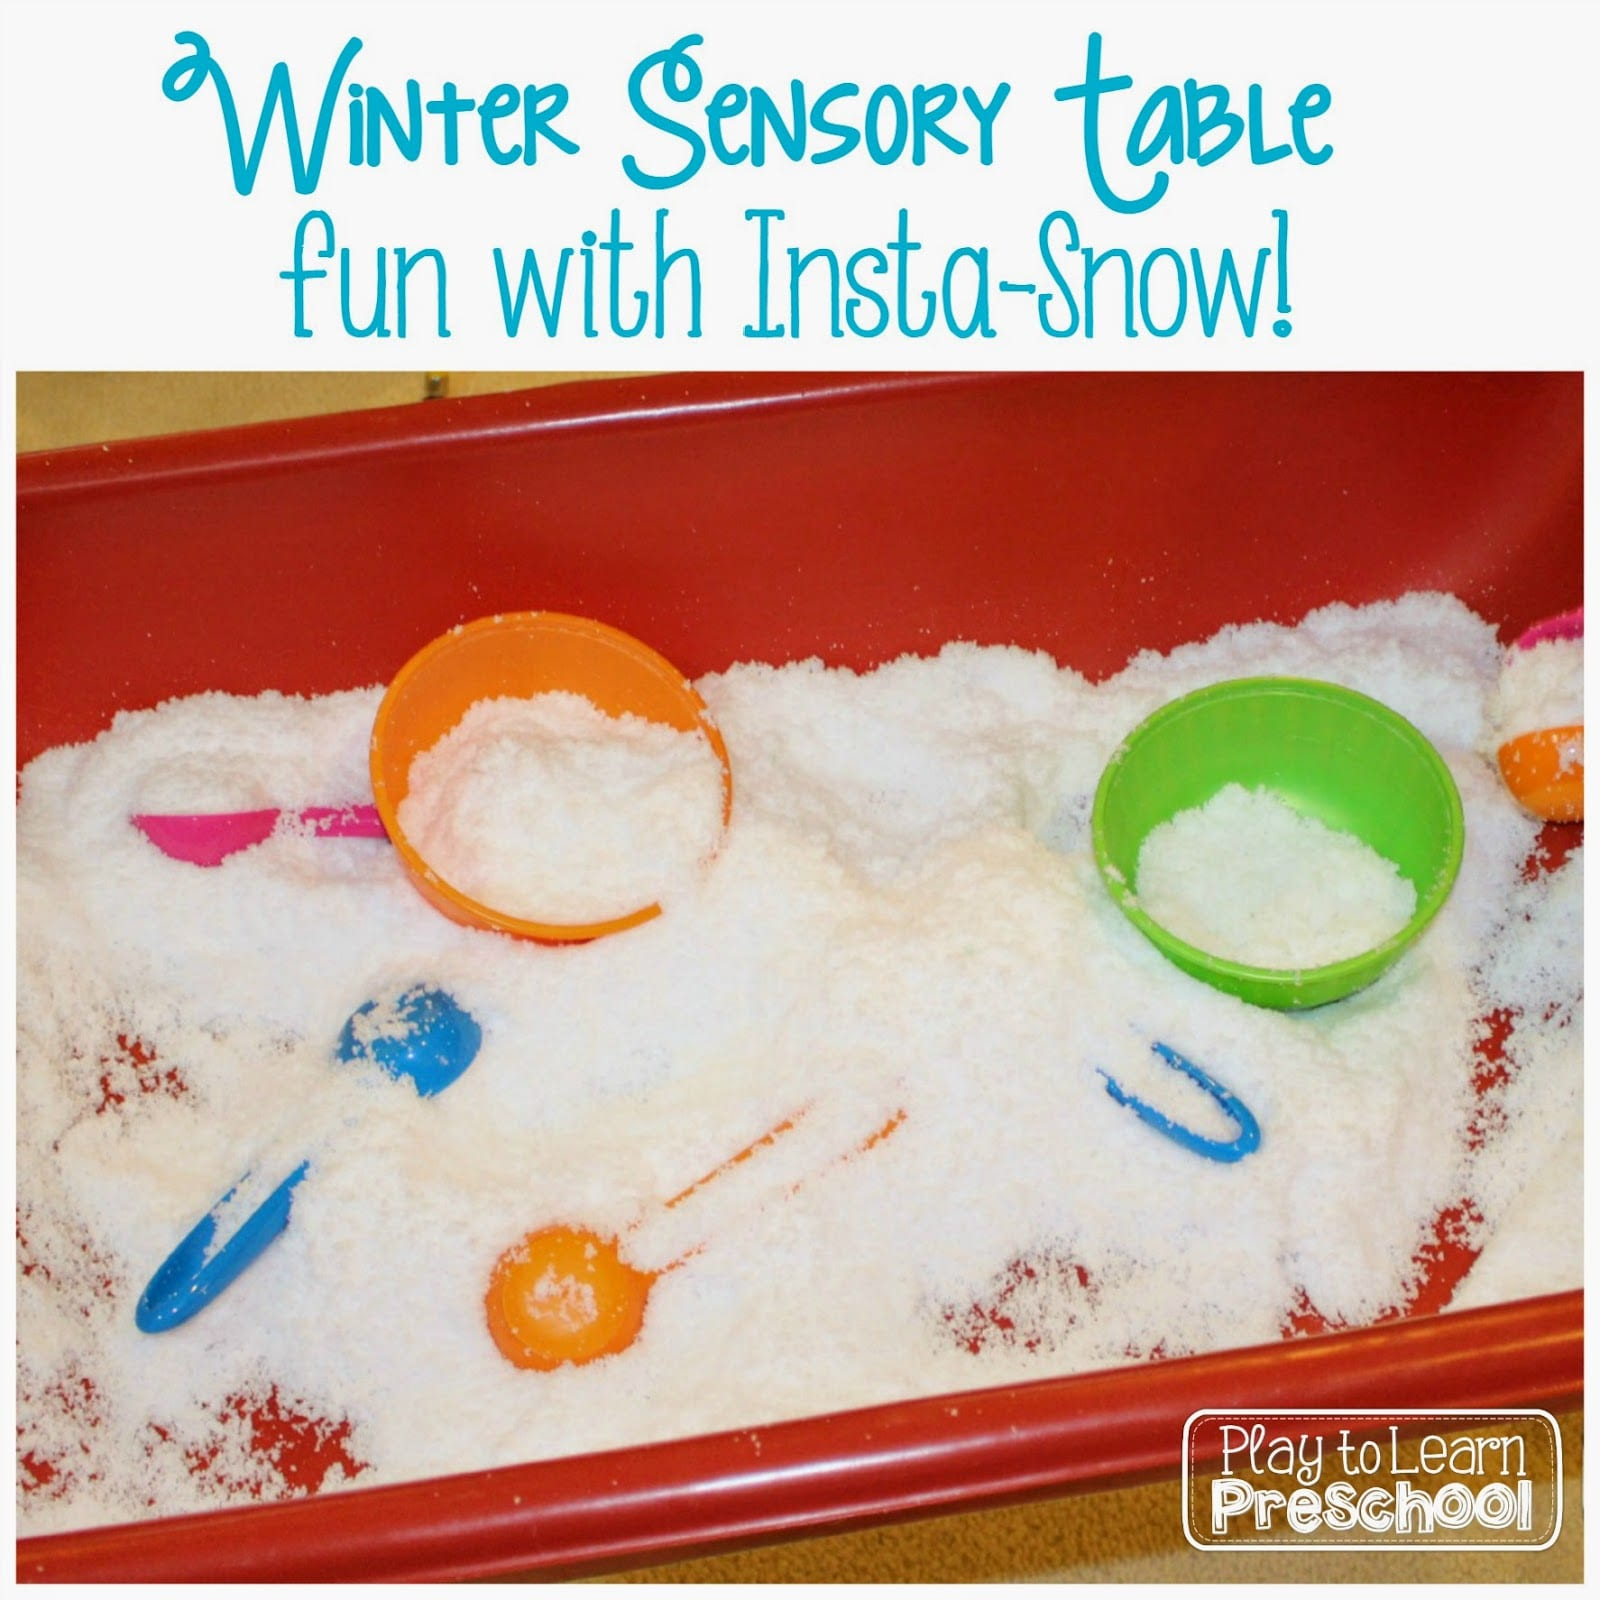 sensory table ideas for preschool insta snow sensory table play to learn 886